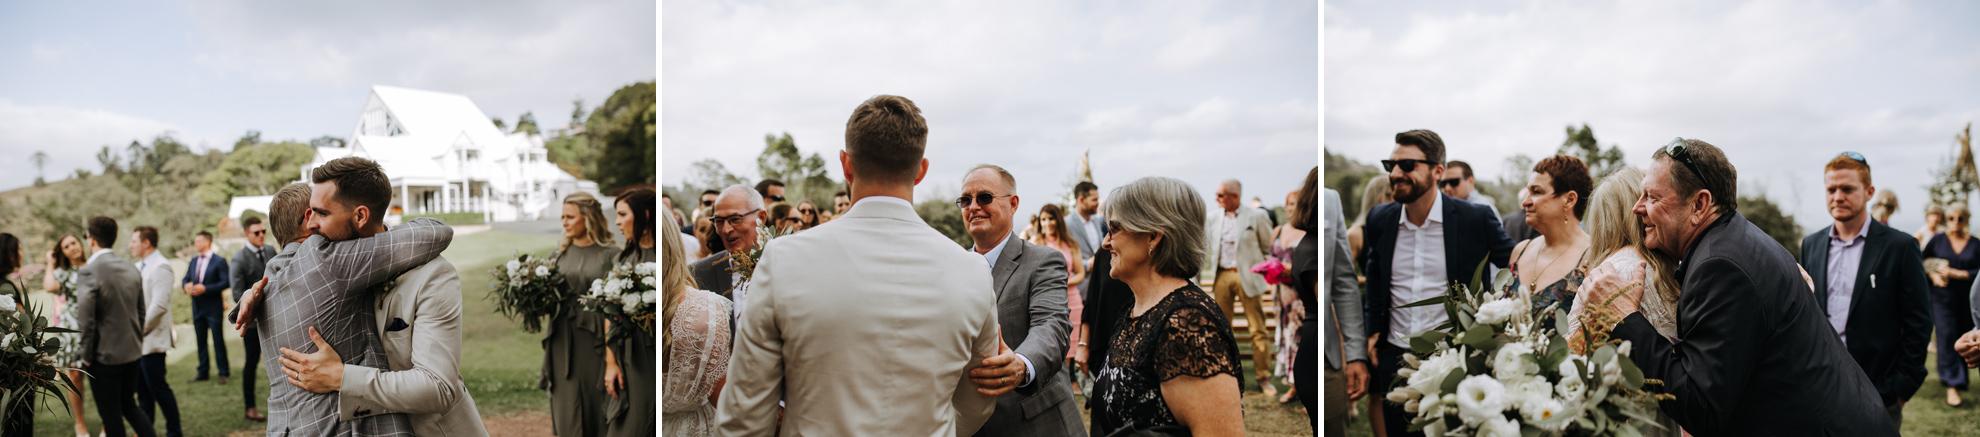 053-Kirby_Lewis_Maleny_Manor_Wedding.jpg